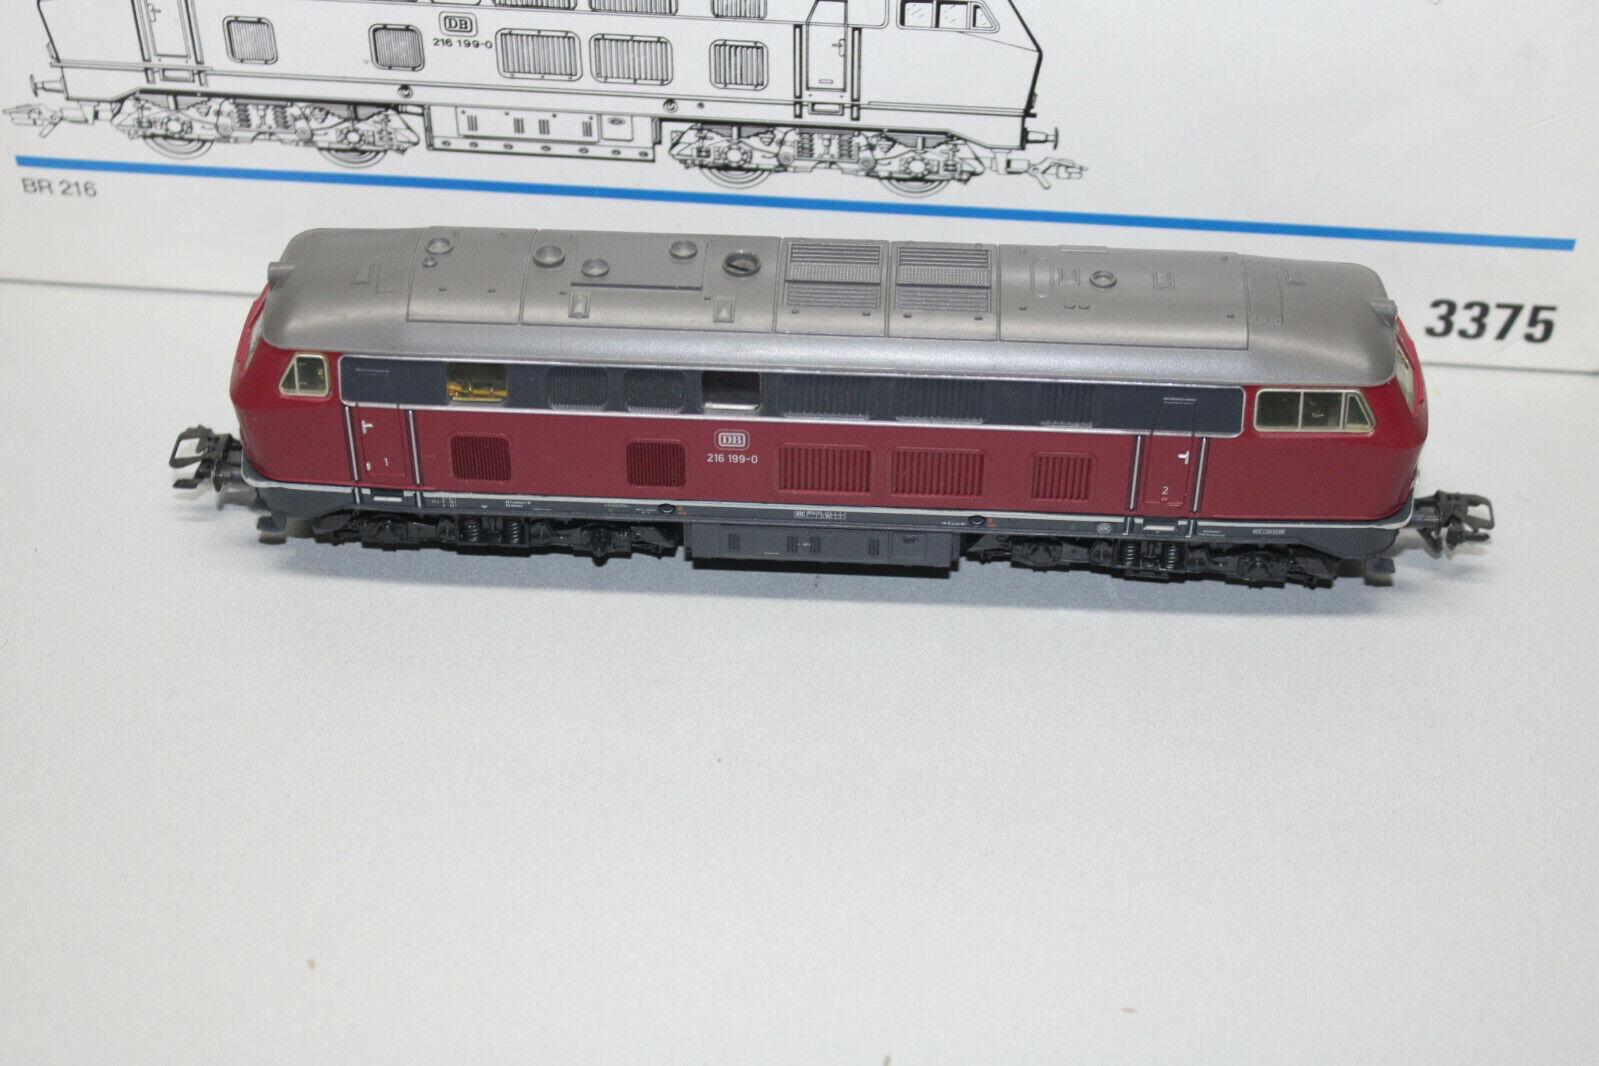 Märklin 3375 Digital Diesellok Baureihe 216 199-0 DB Spur H0 OVP